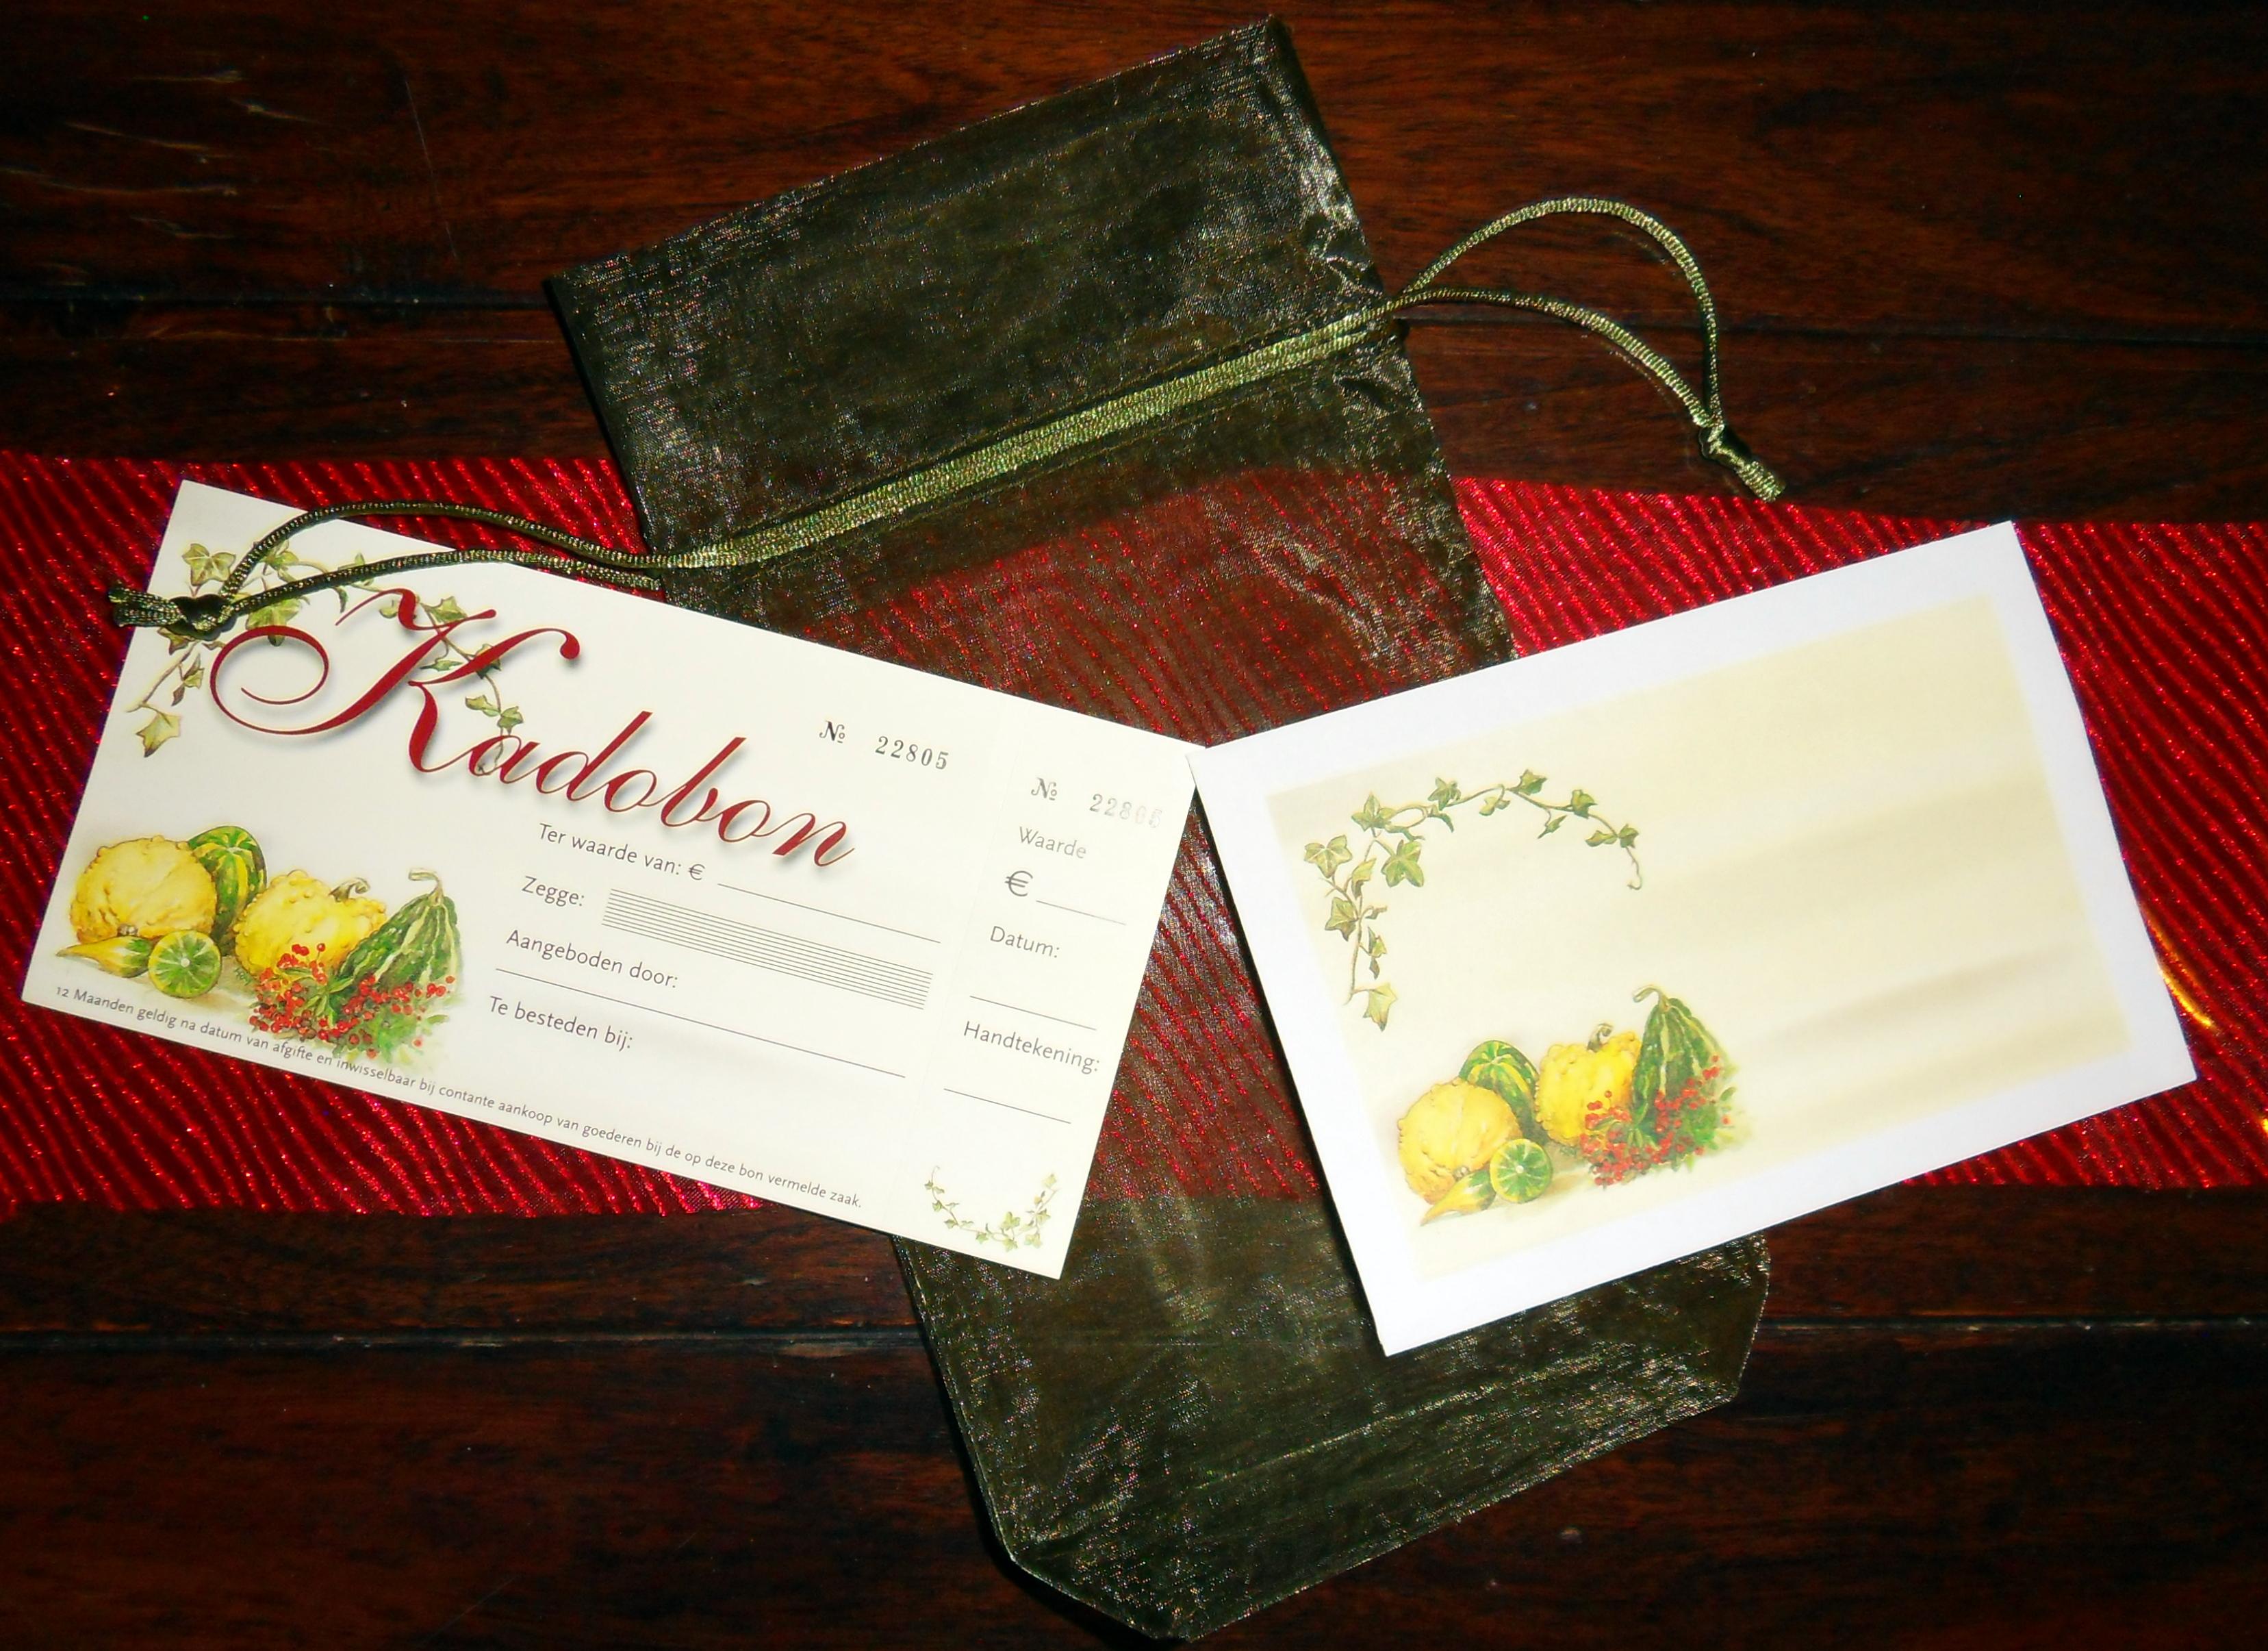 Cadeaubon Workshops